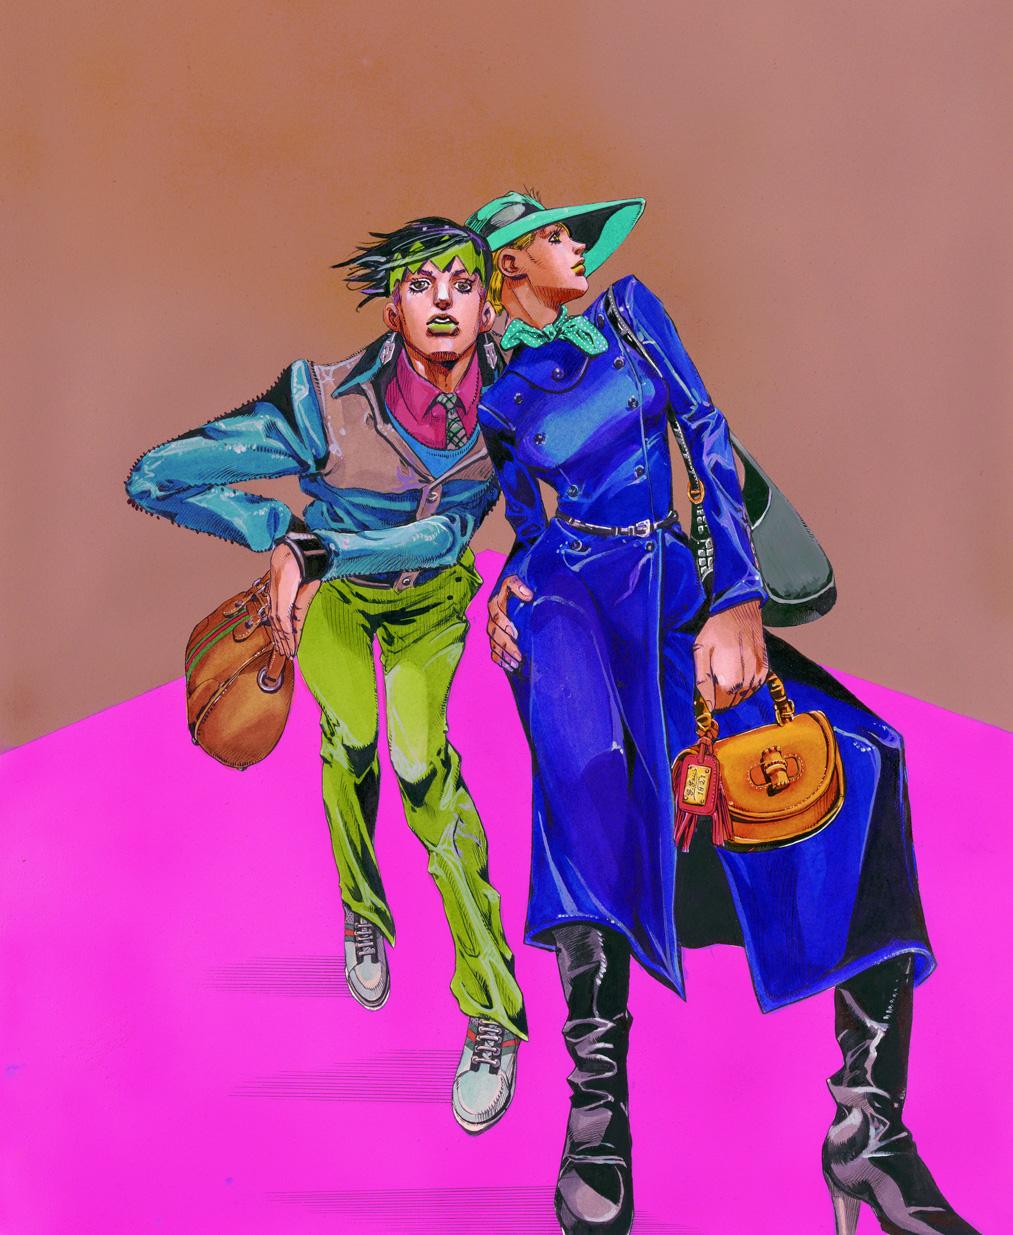 235463d3685d 9月17日(土) グッチ新宿 リニューアルオープン荒木飛呂彦 の原画展 開催 ...